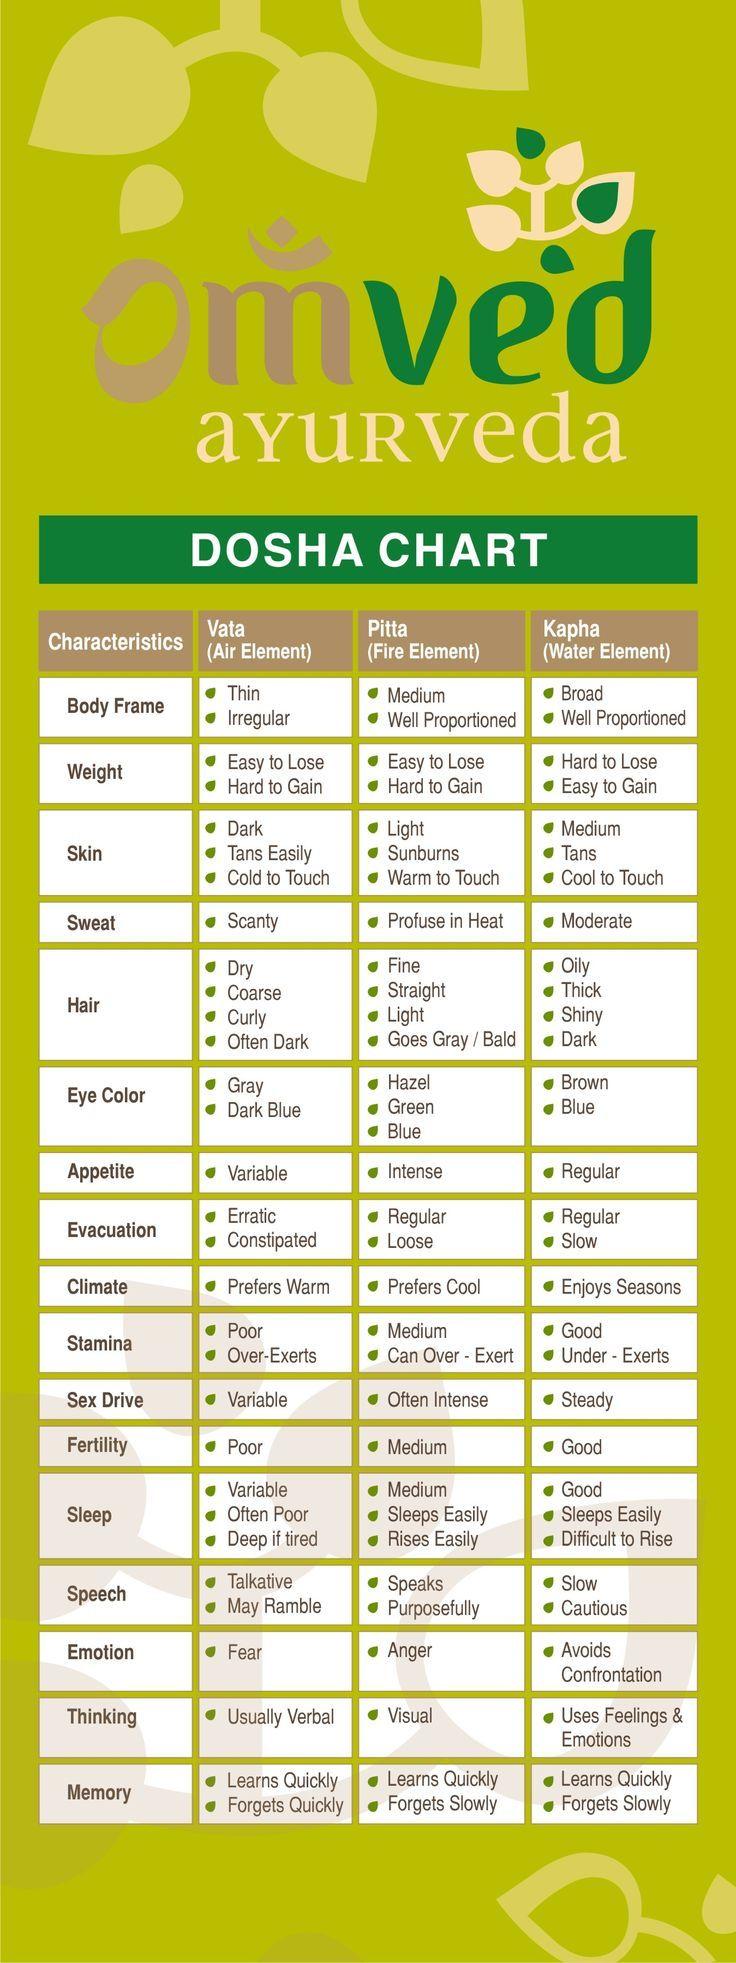 Ayurveda | Ayurvedic products, Charts and Briefs